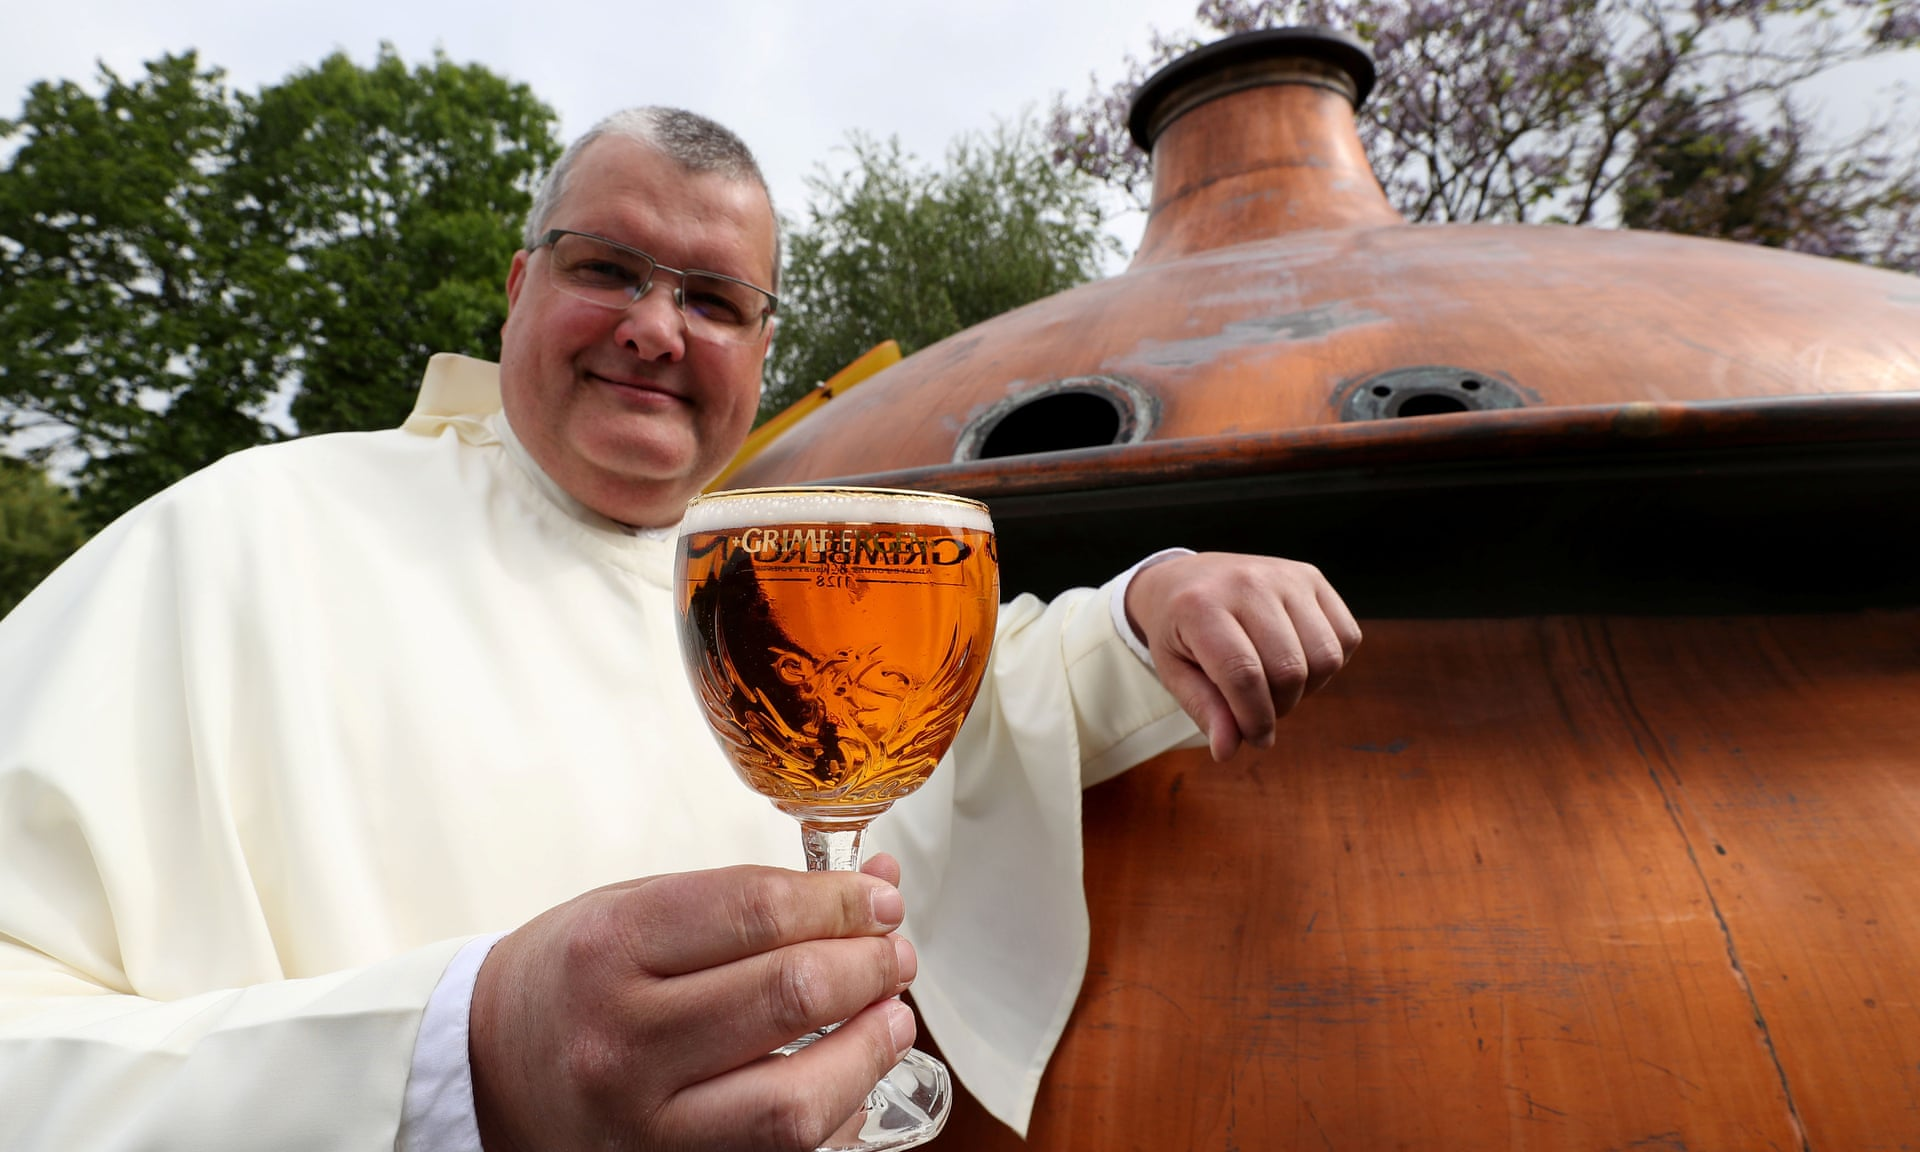 belgian monk 220 year old beer recipe - Belgian monks resurrect 220-year-old beer after finding recipe